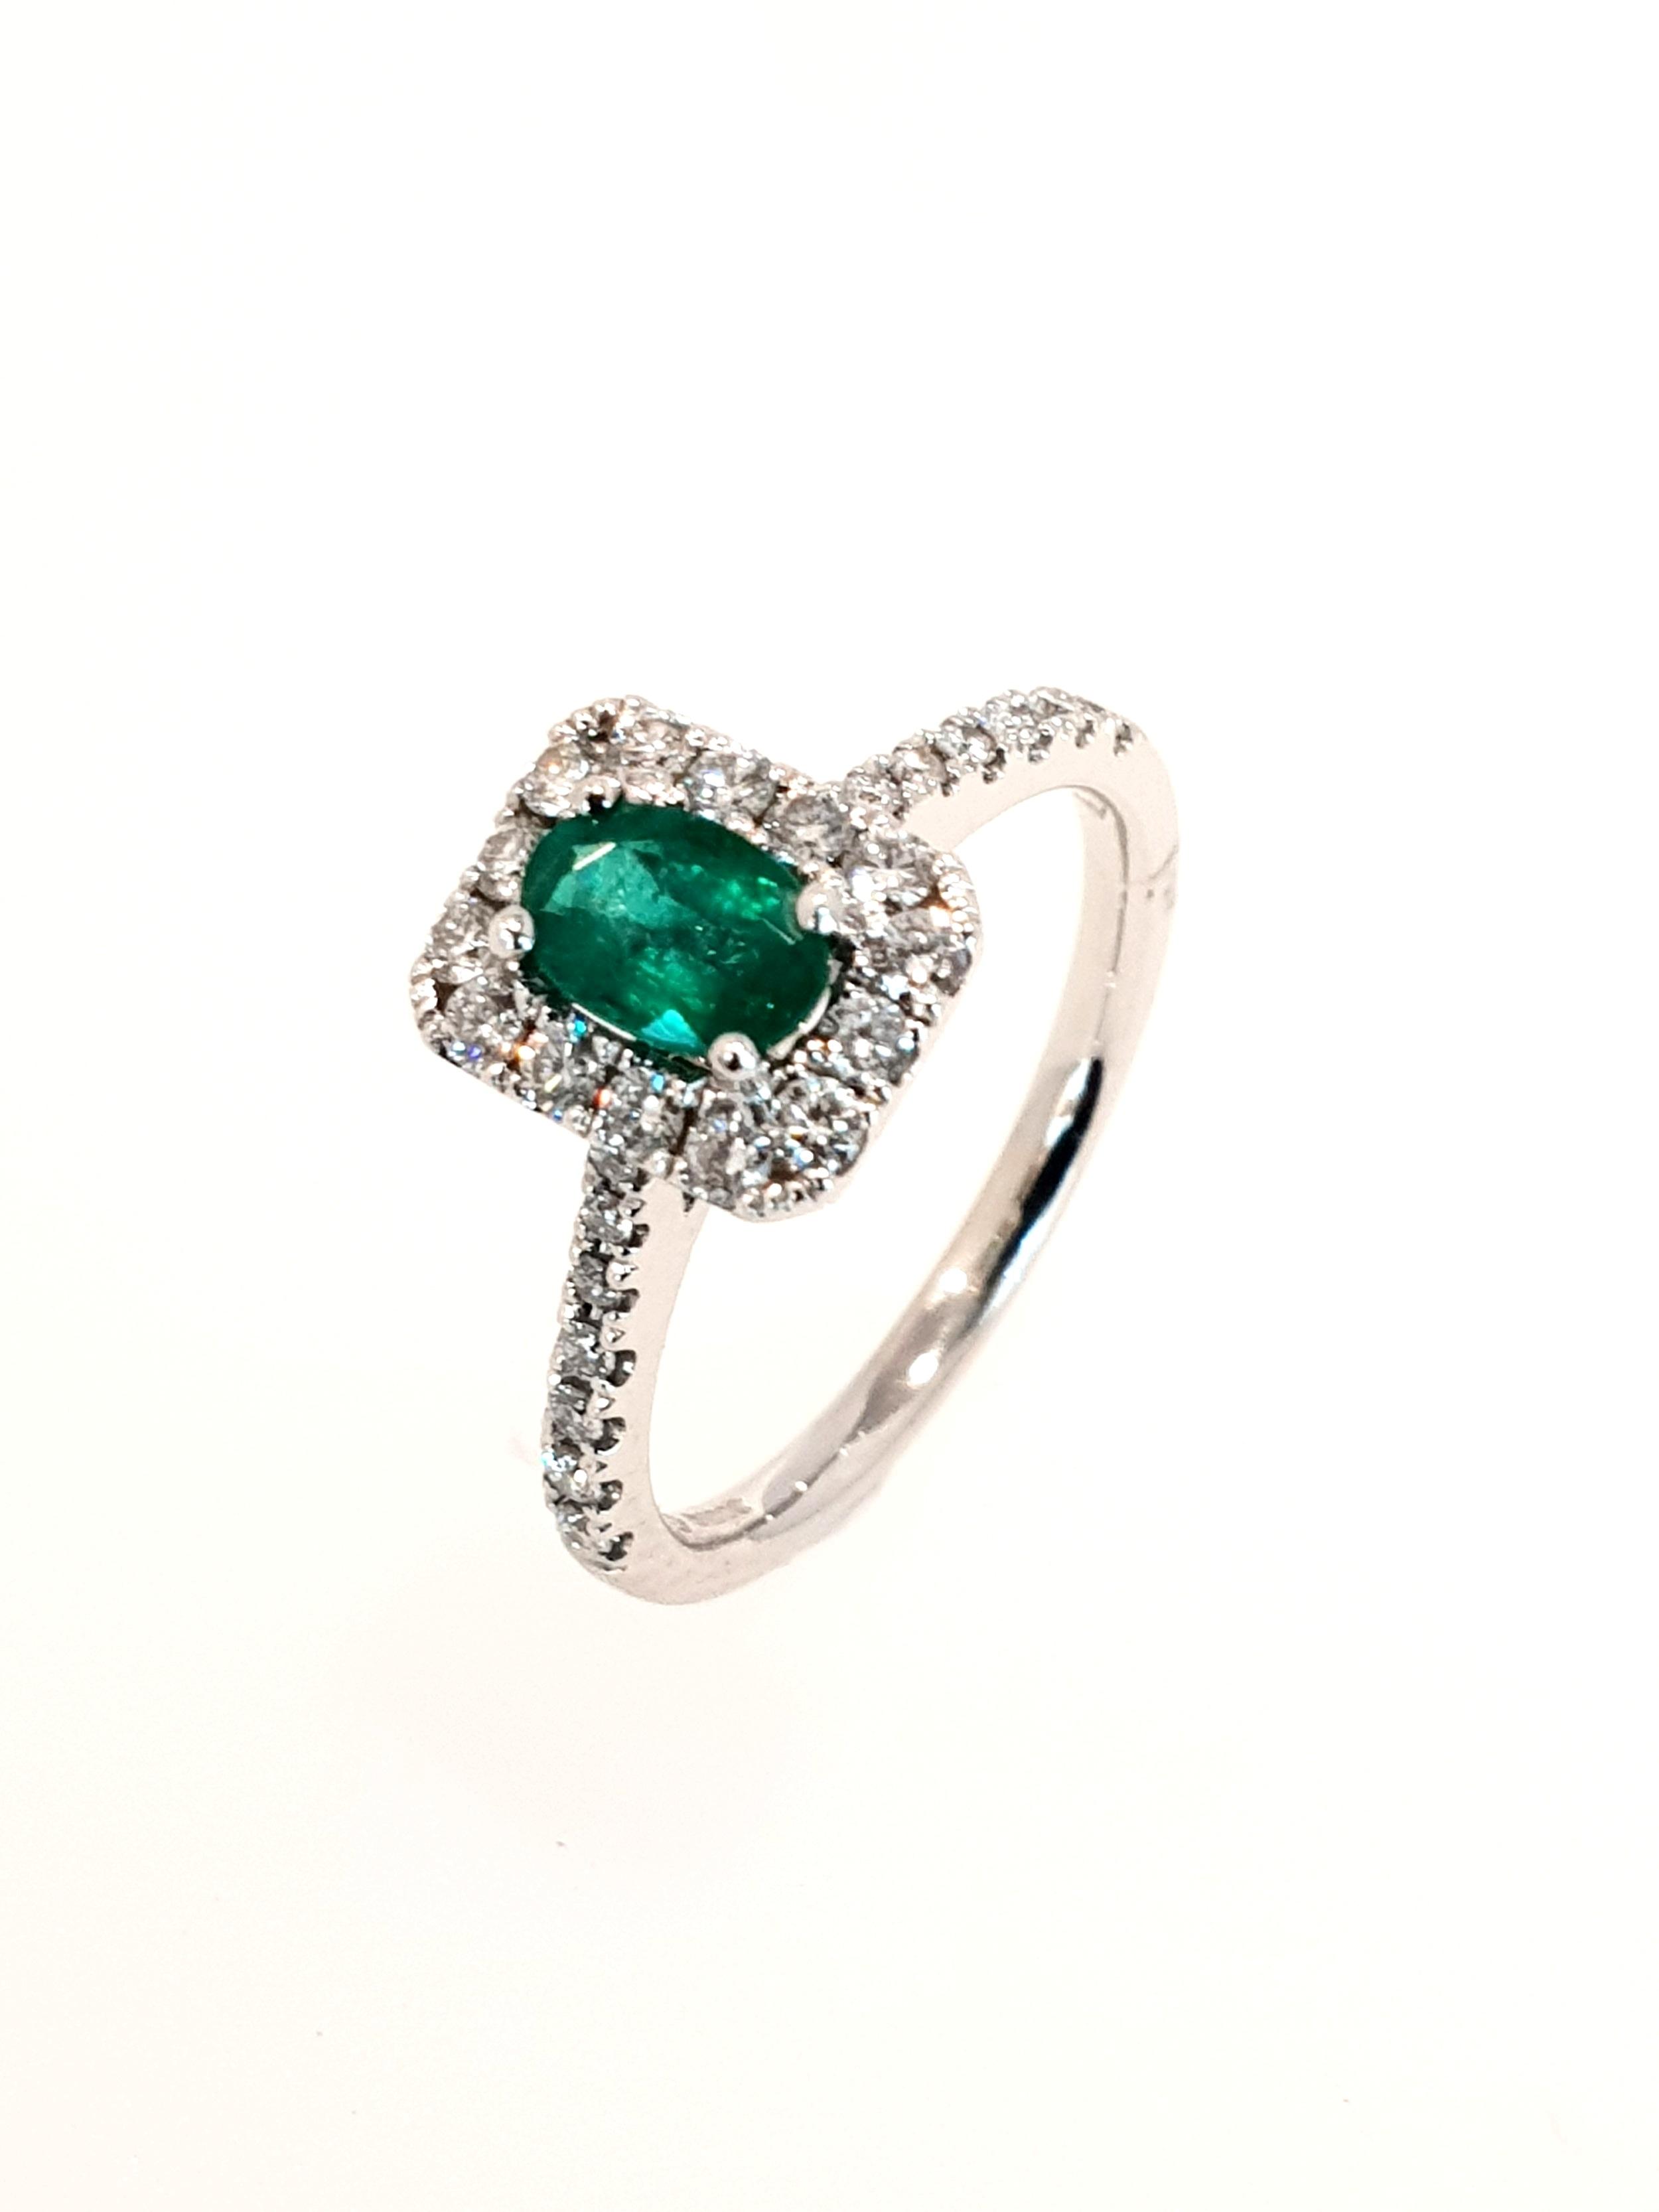 18ct White Gold Emerald(.43ct) & Diamond Ring  Diamond: .37ct, G, Si1  Stock Code: N8985  £1900